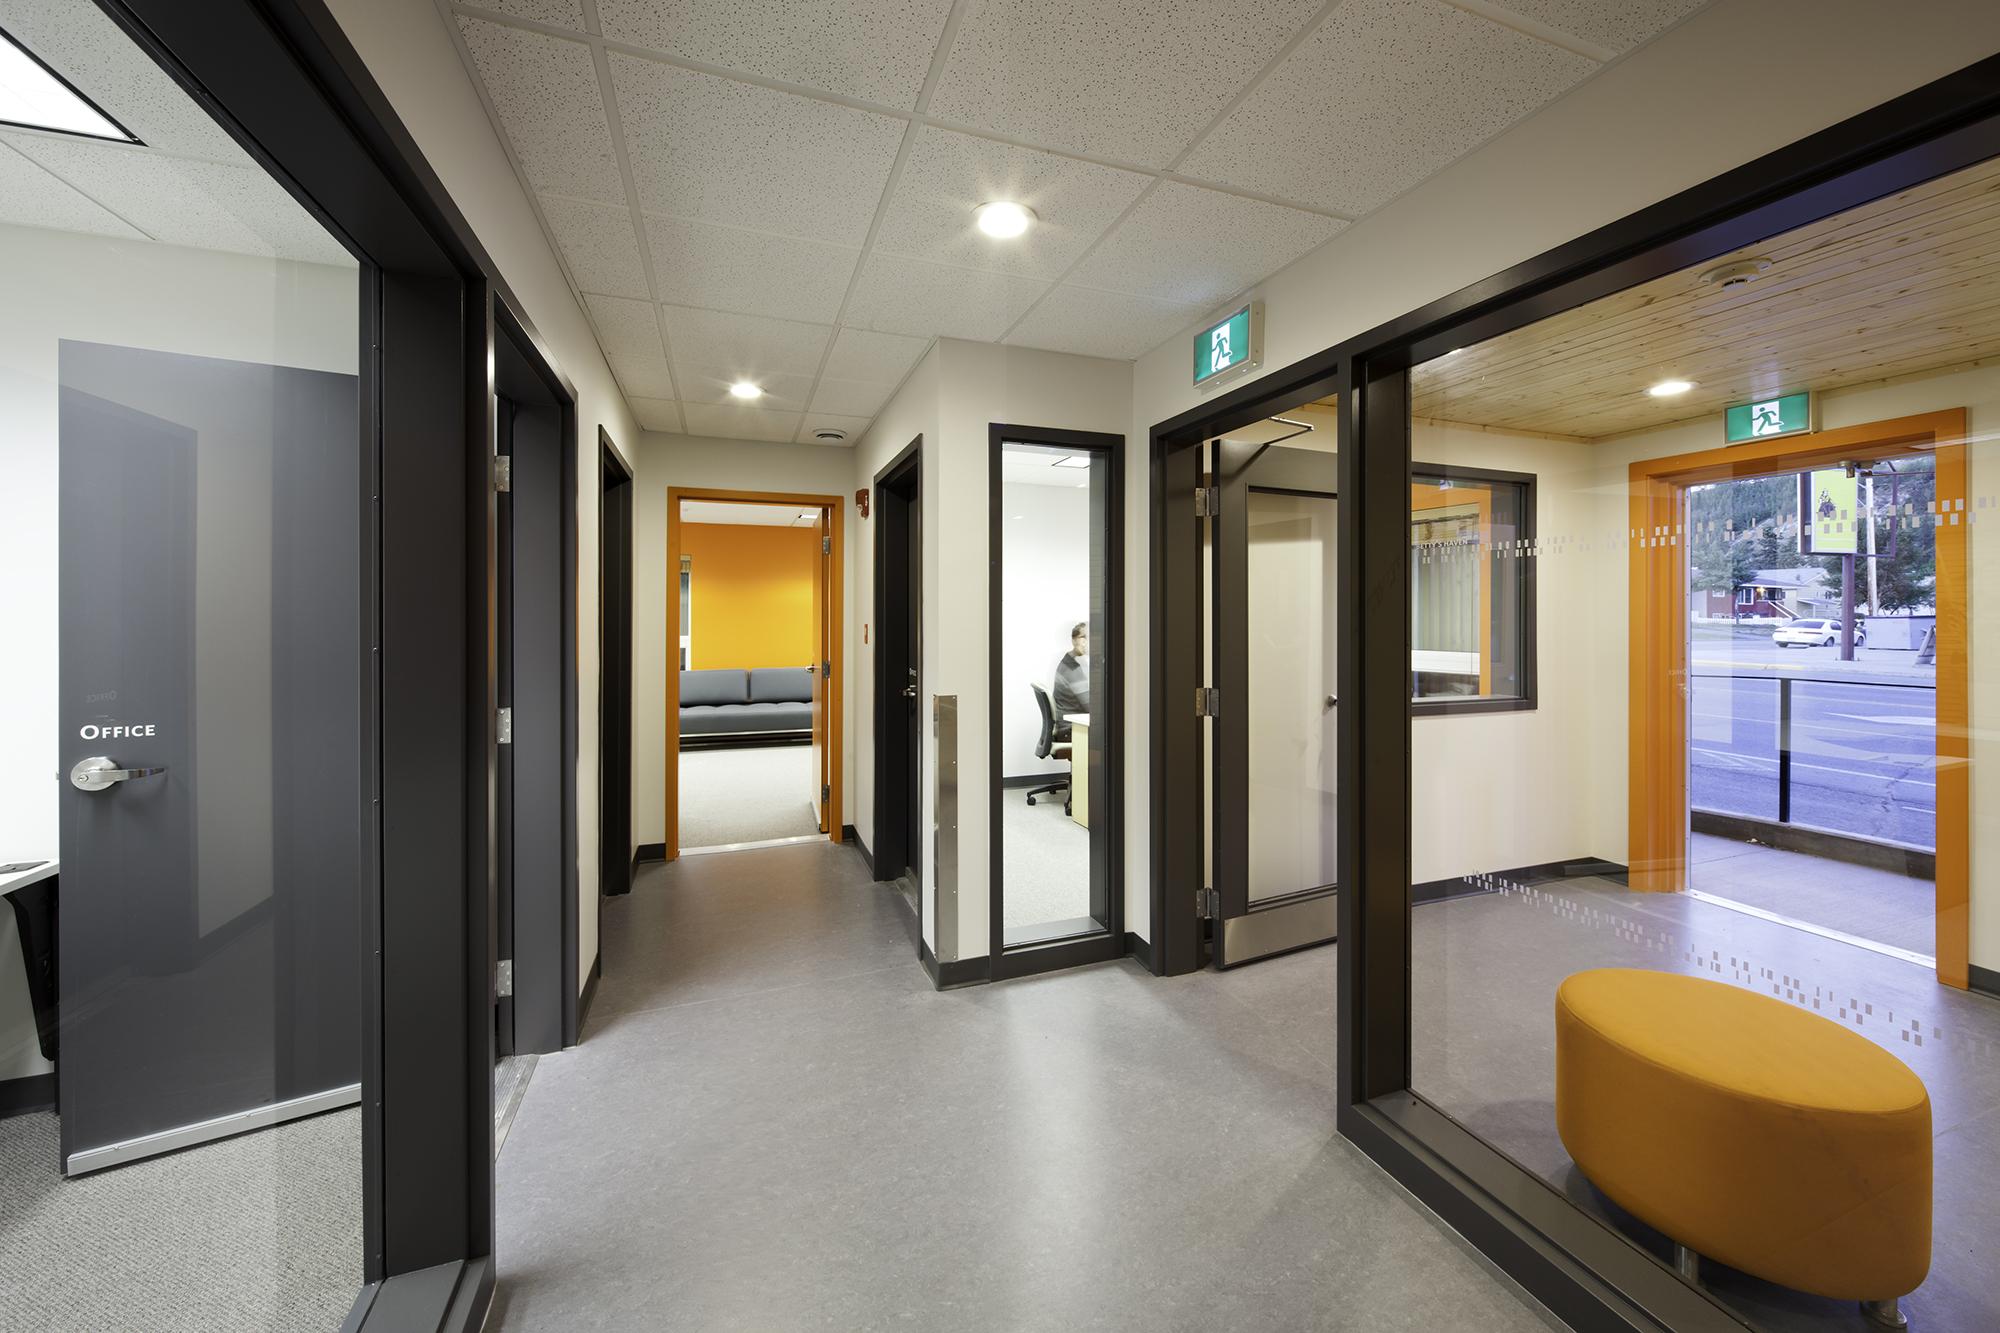 Bettys Haven Second Stage Housing - Kobayashi + Zedda Architects